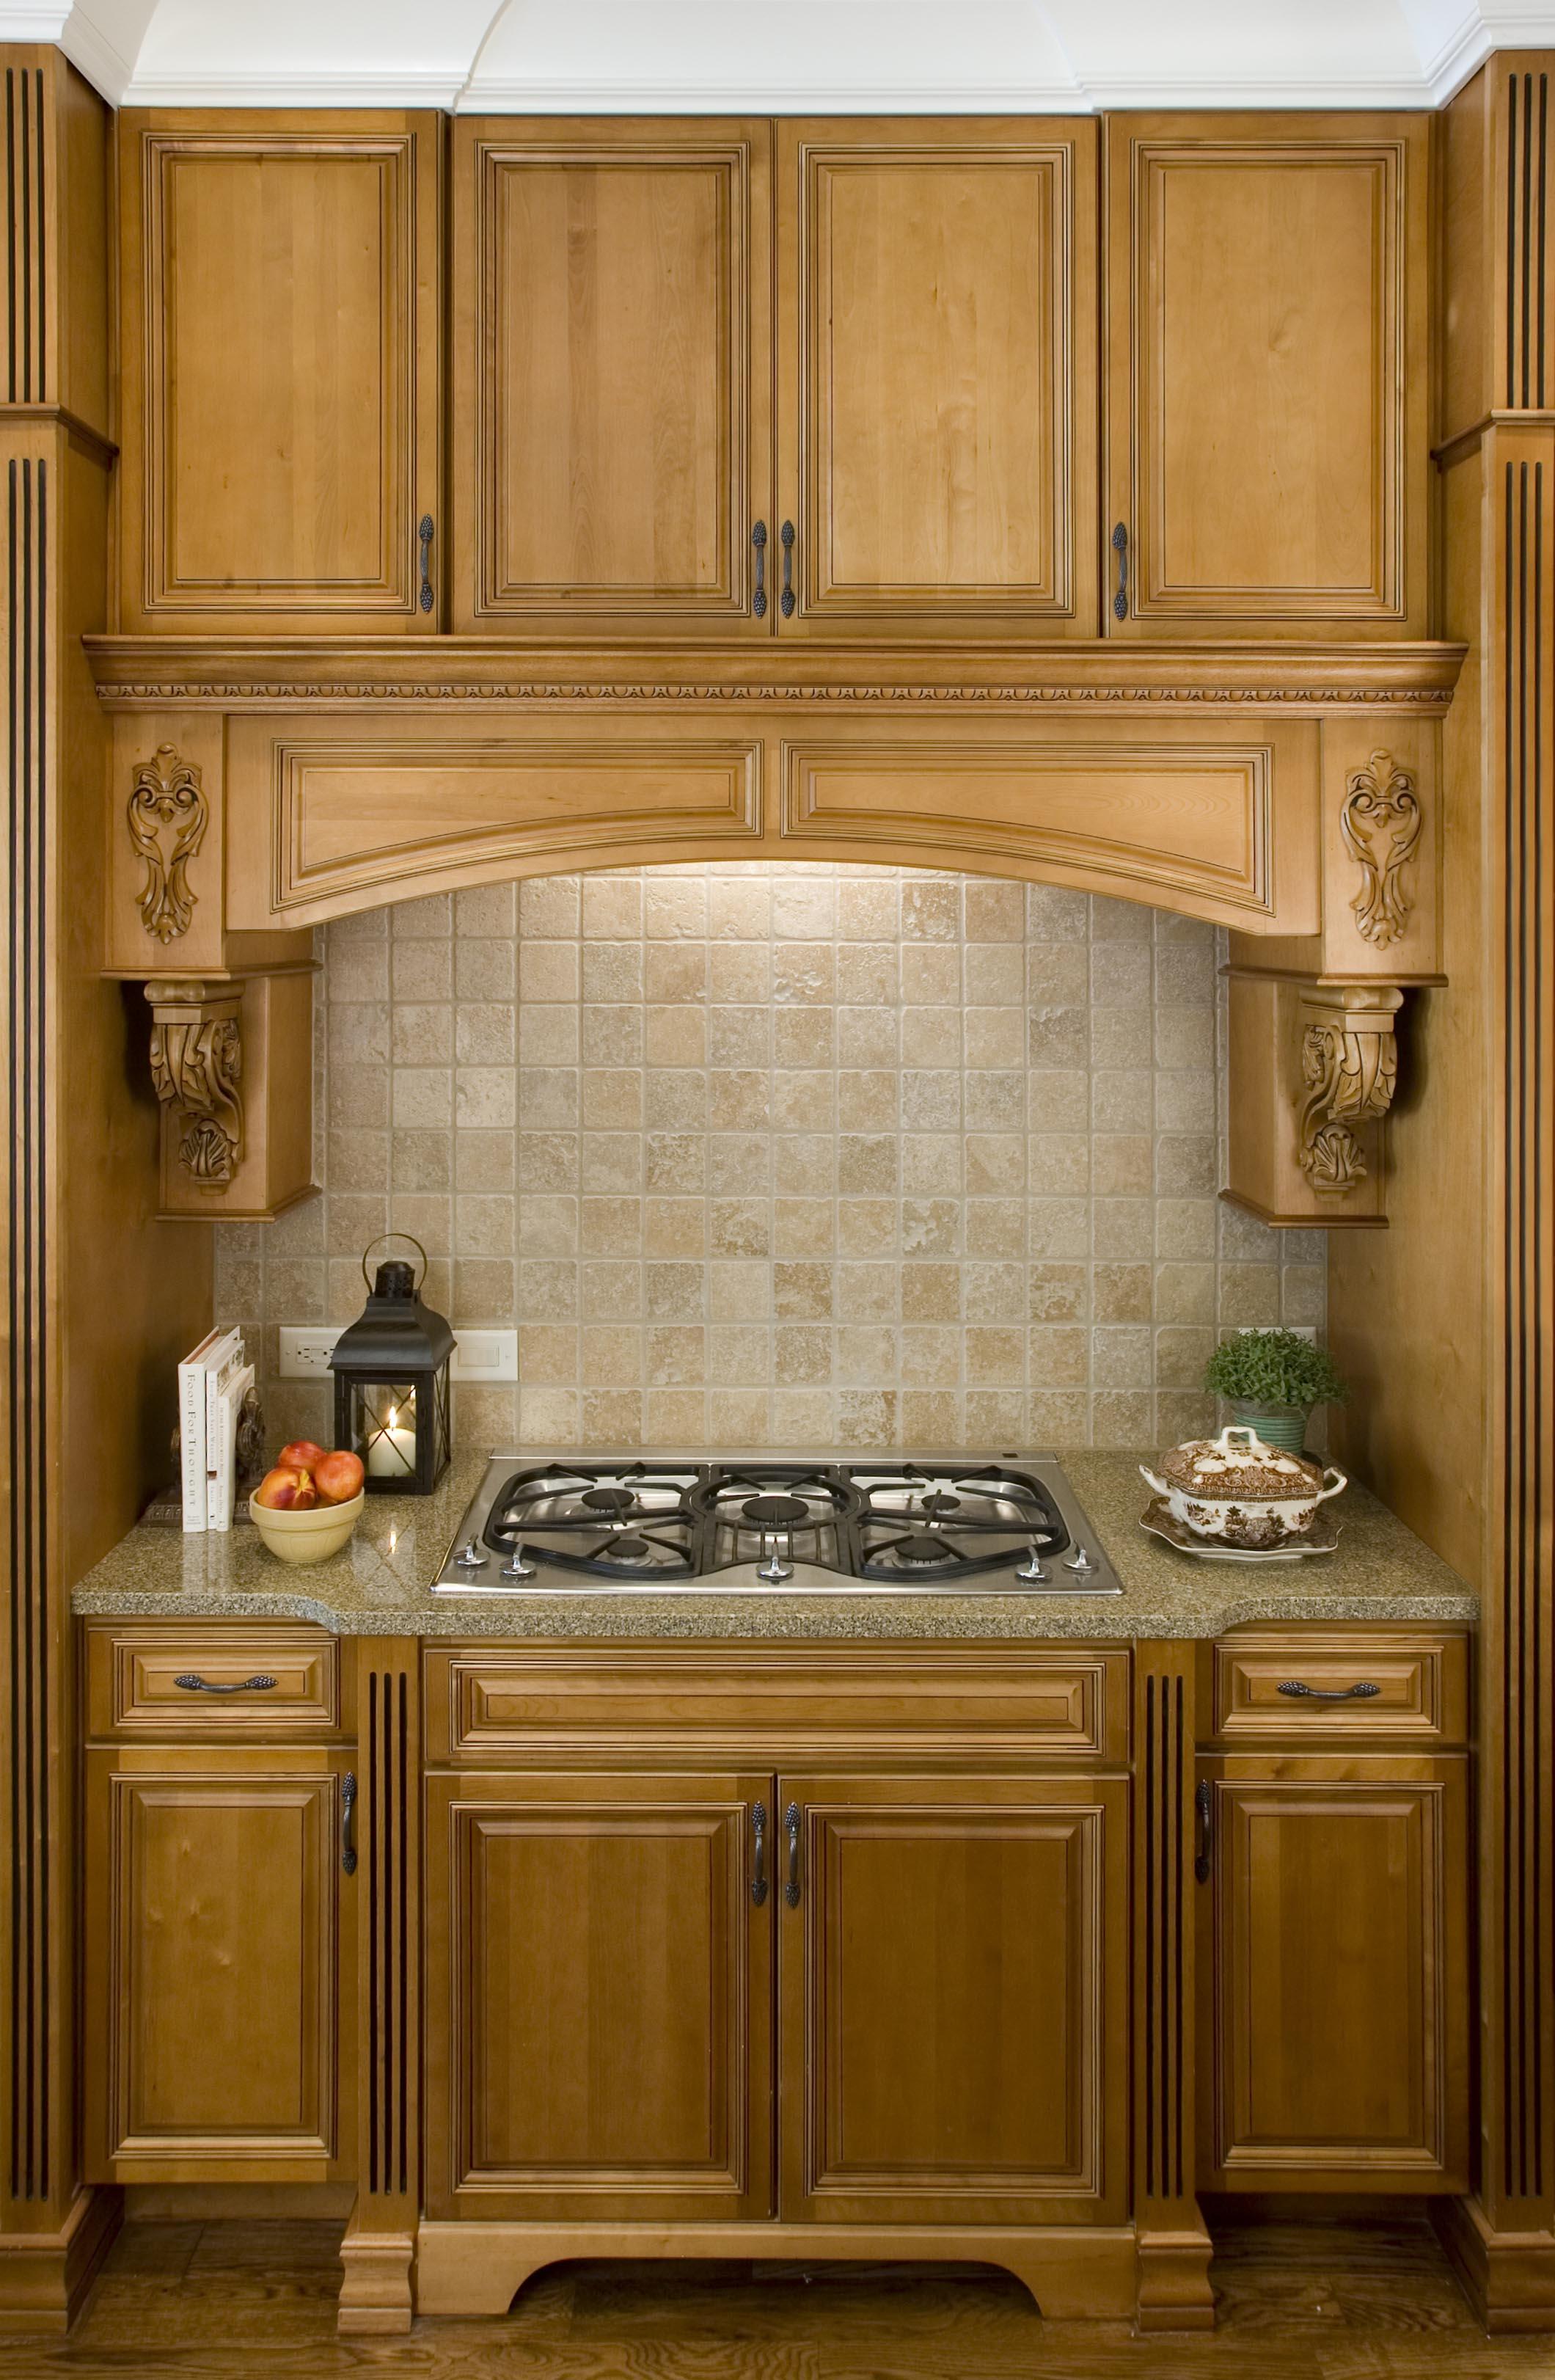 Kitchen Cabinets Doors Online: RTA Kitchen Cabinet Door Styles